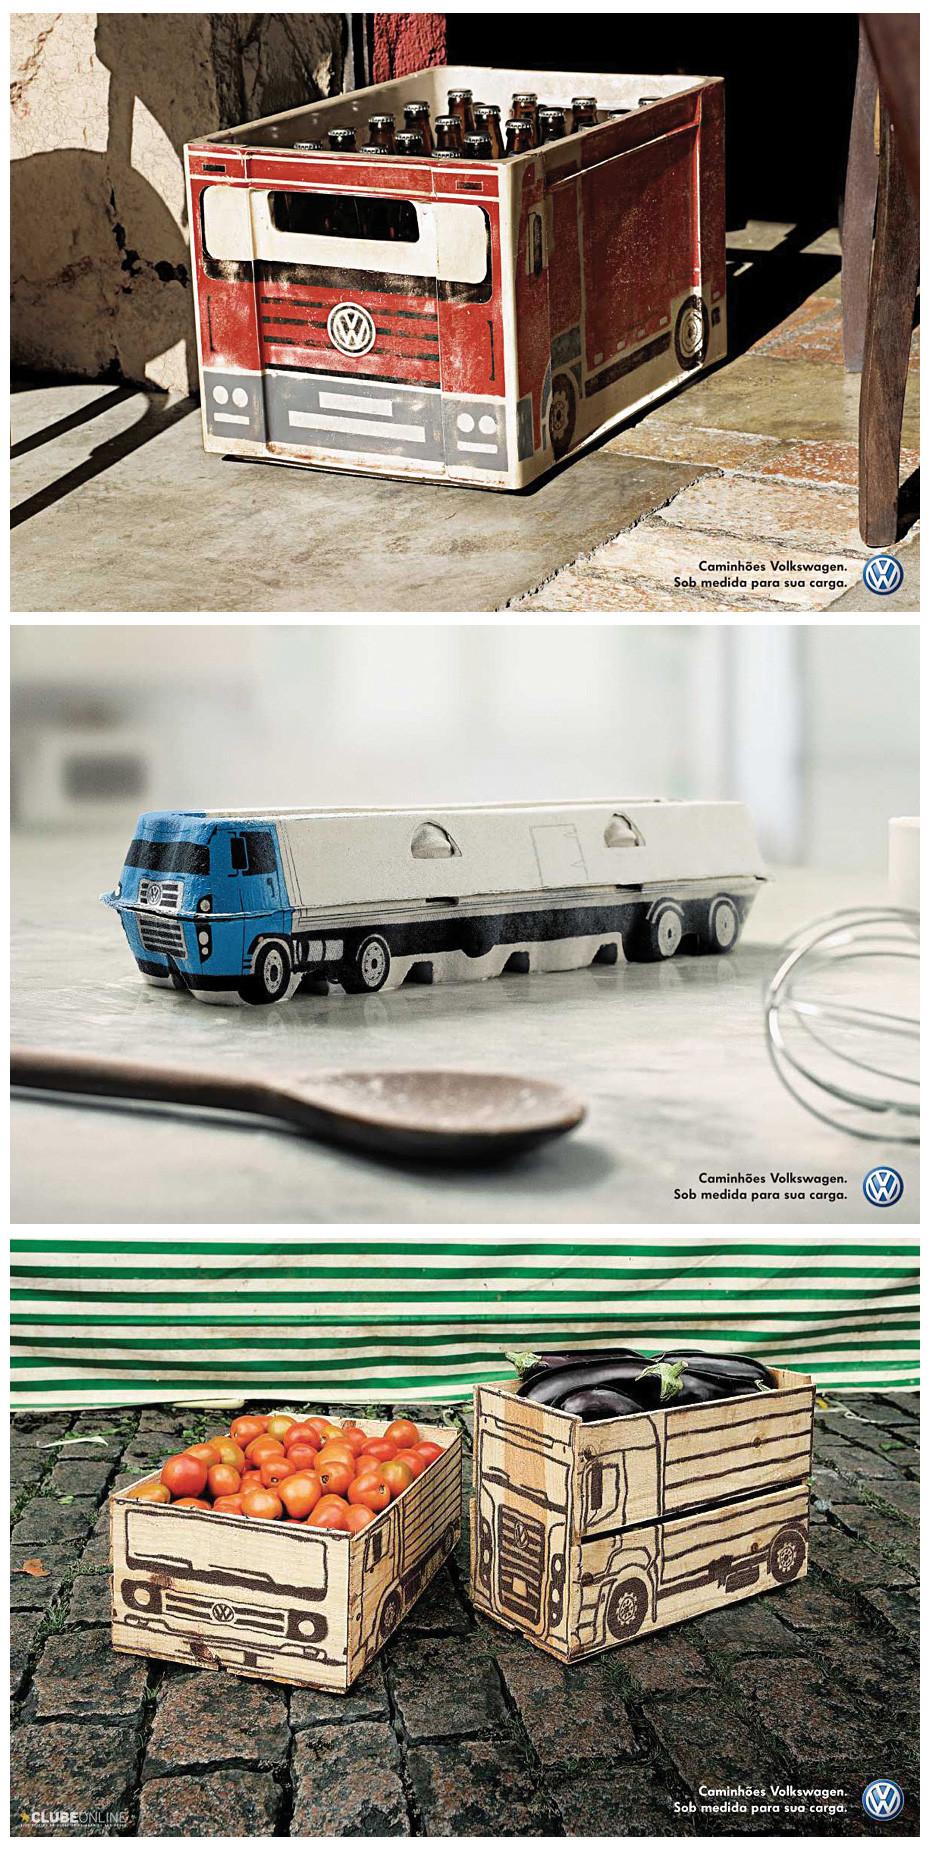 VW-caminhões.jpg